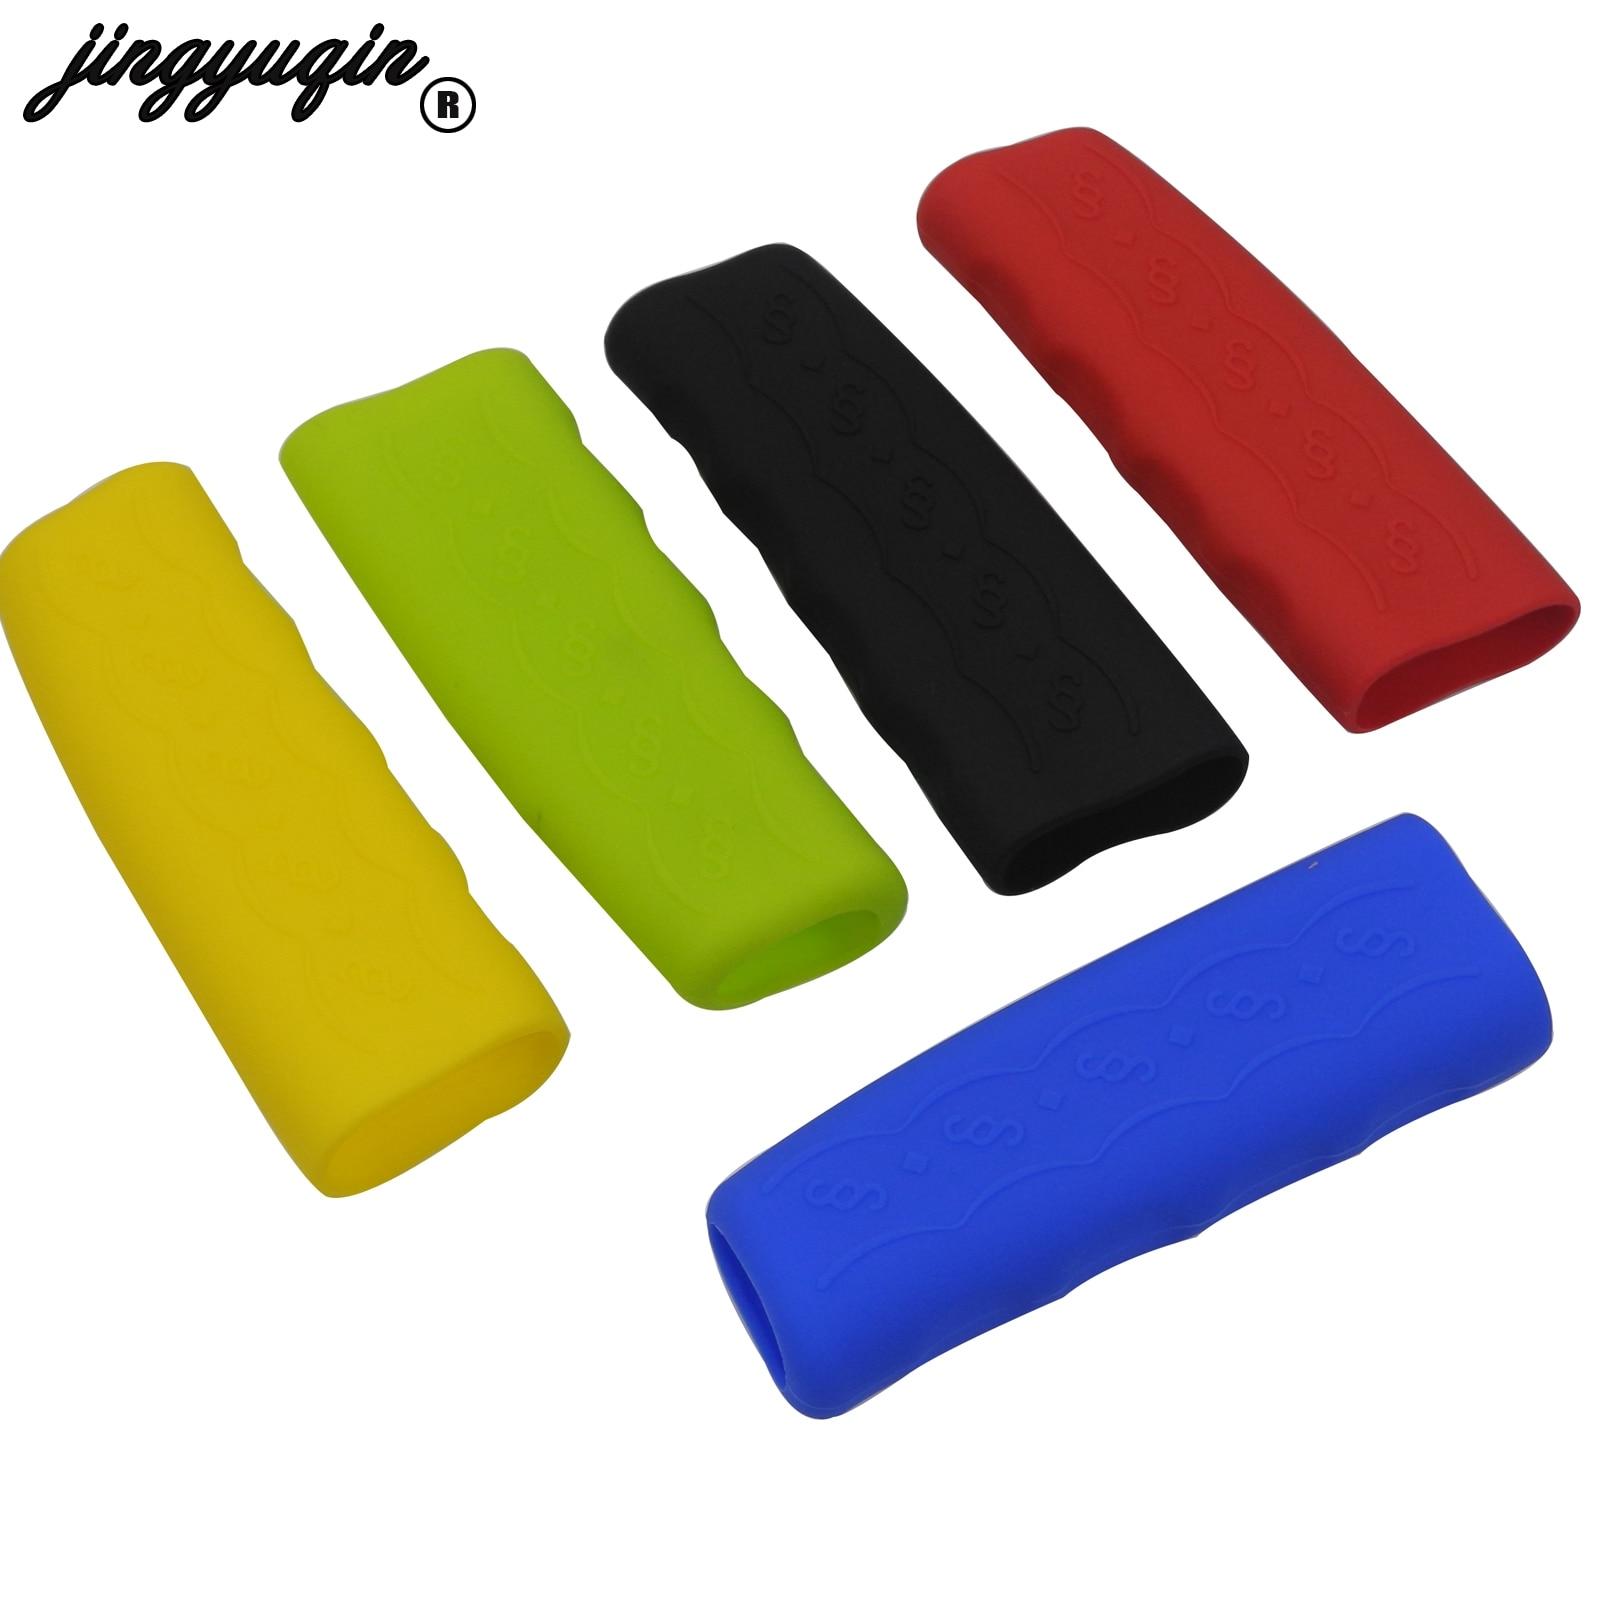 Jingyuqin Car Handbrake Covers Sleeve Silicone Gel Case Anti-slip Parking Hand Brake Grips Sleeve Universal Decoration